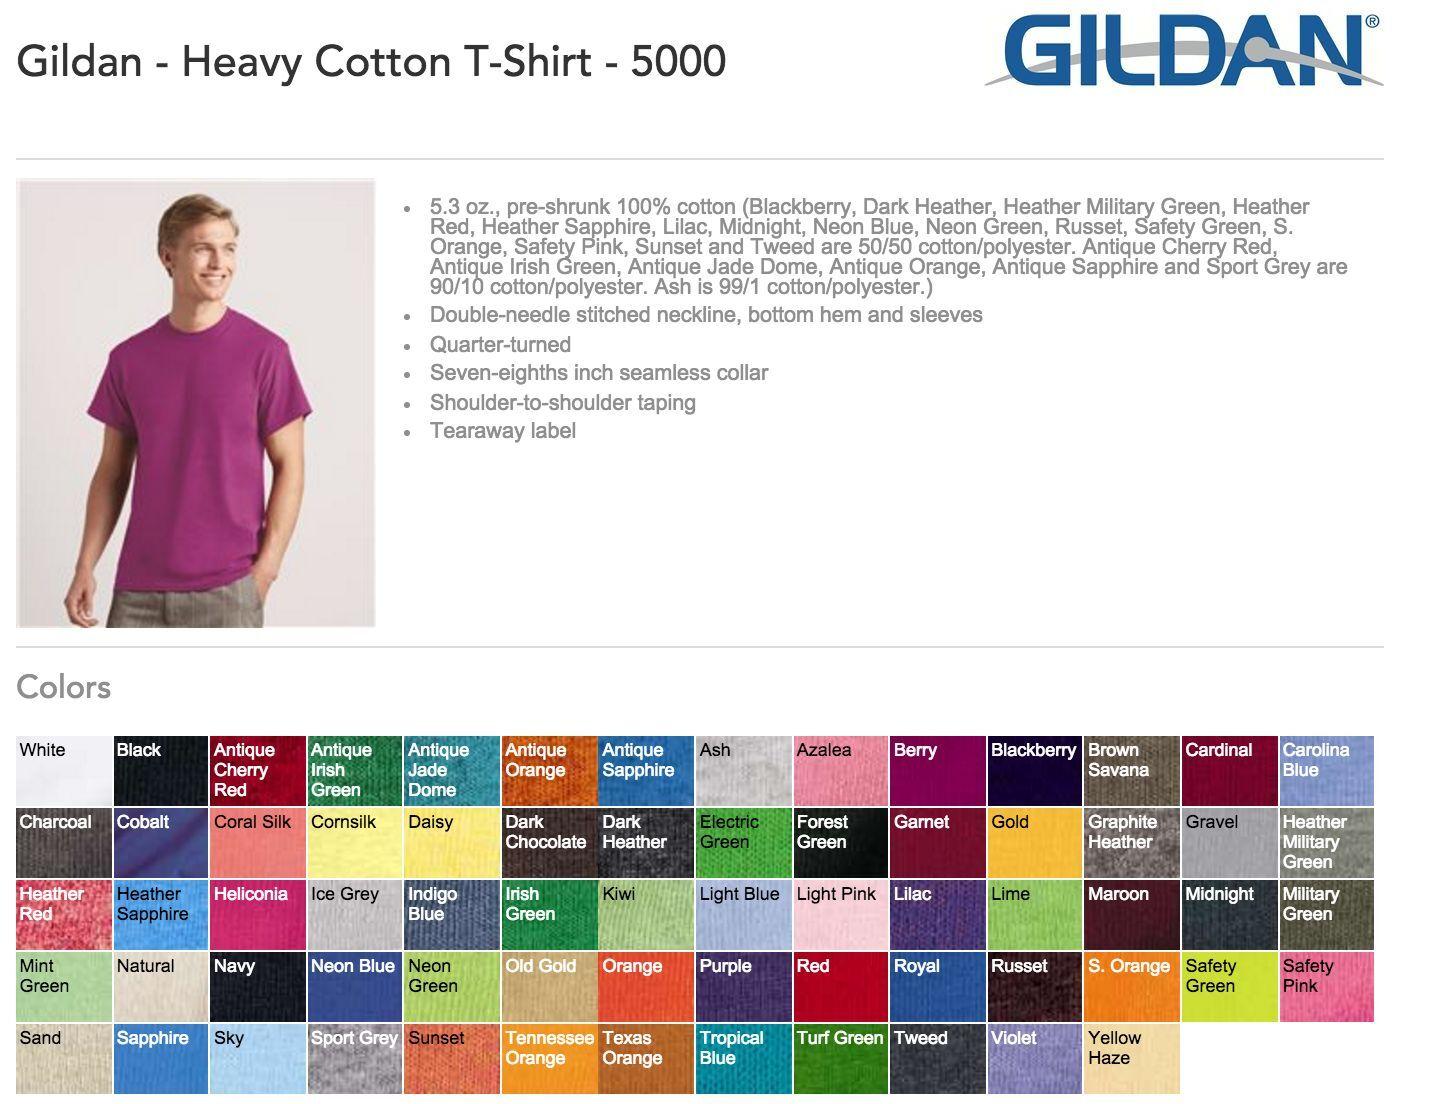 100 Gildan T-SHIRTS BLANK BULK LOTS S-XL Wholesale 1st Quality